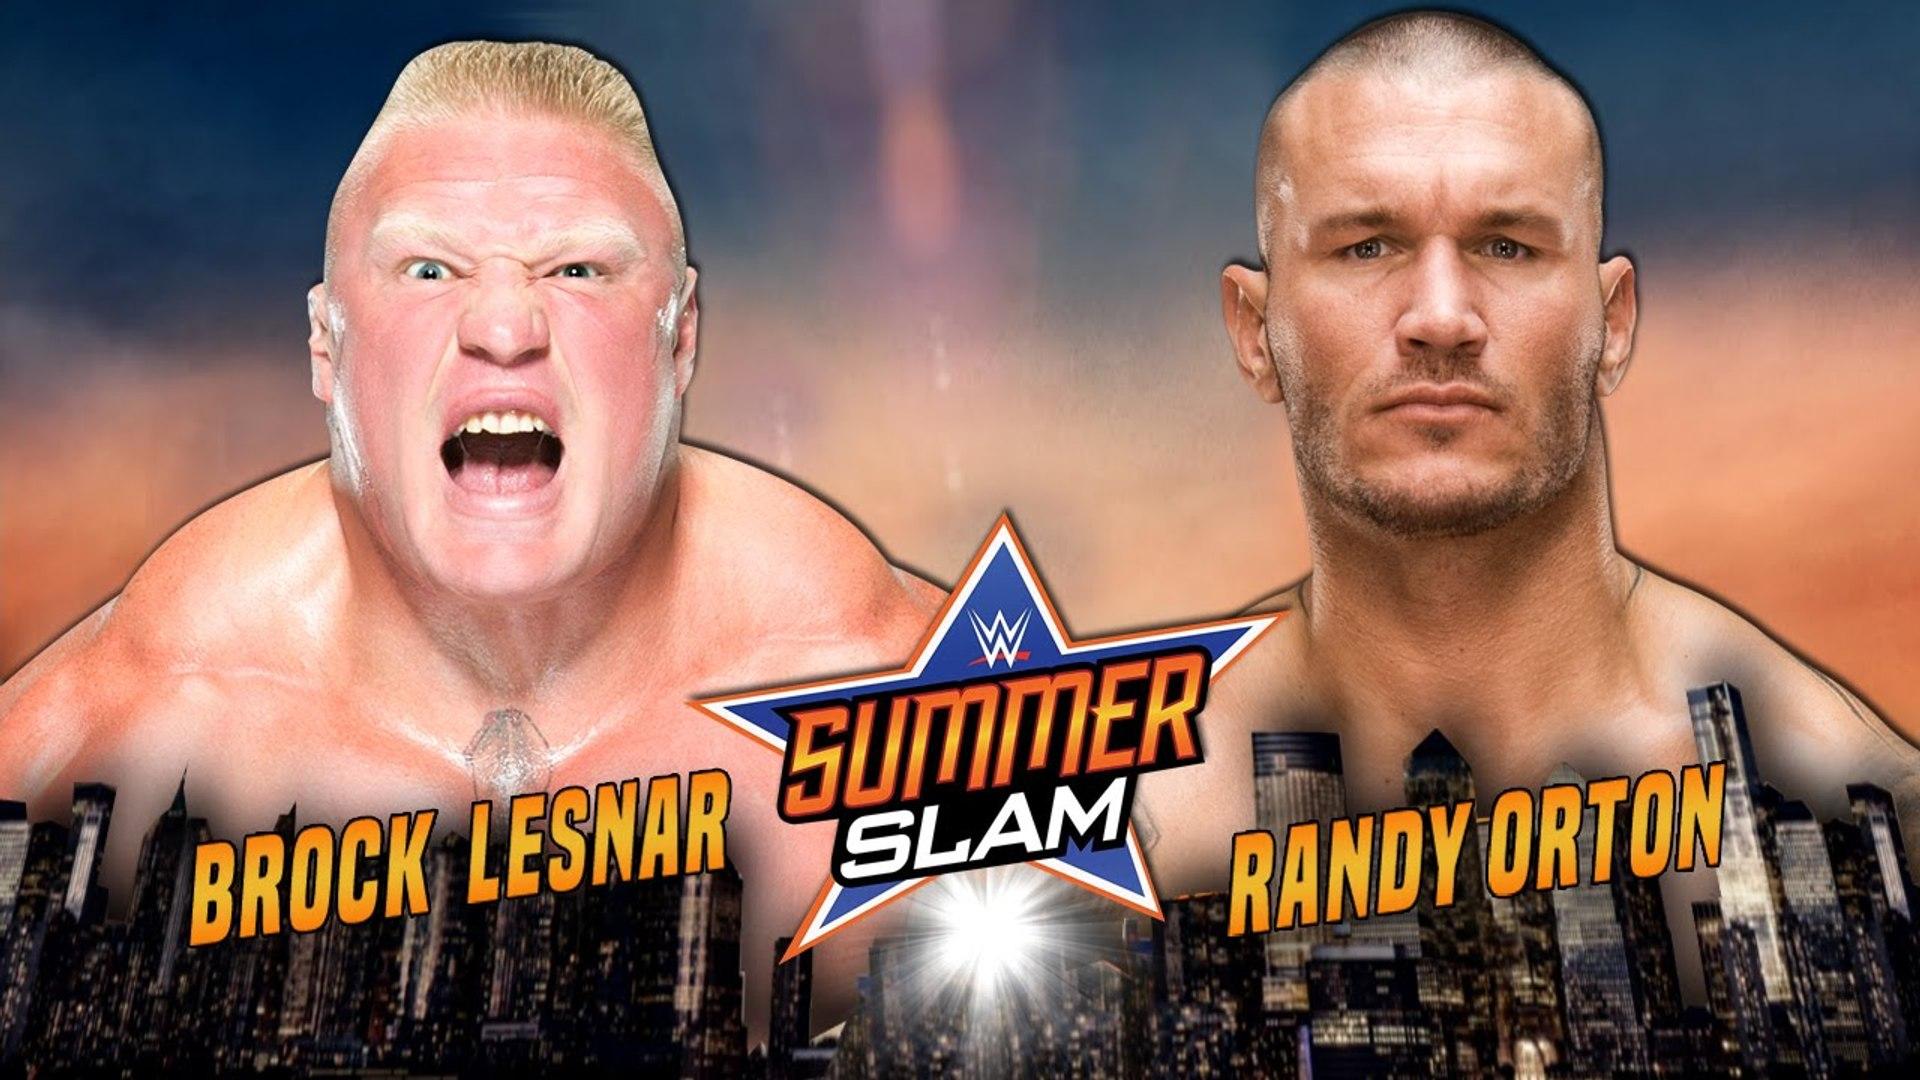 Wwe Summerslam 2016 Brock Lesnar Vs Randy Orton 21 August